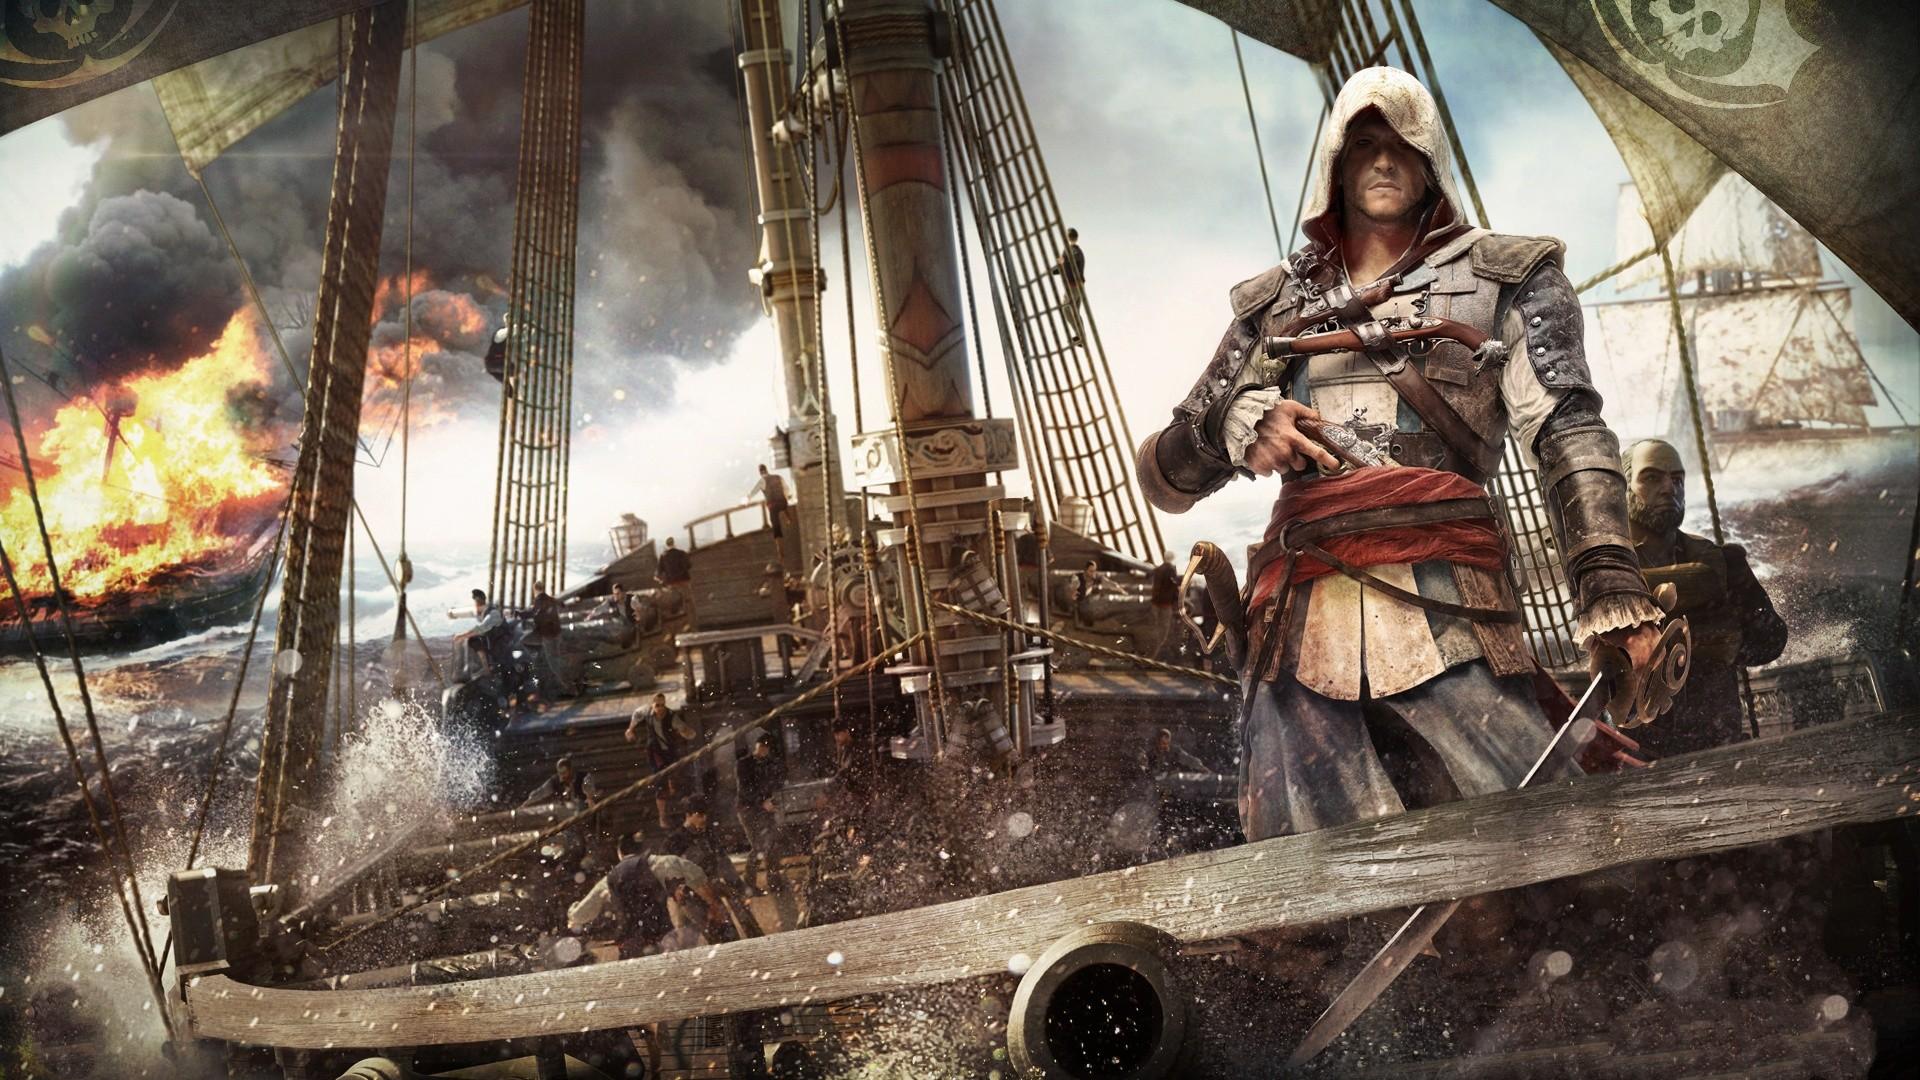 Assassin's Creed Black Flag Background Full HD.